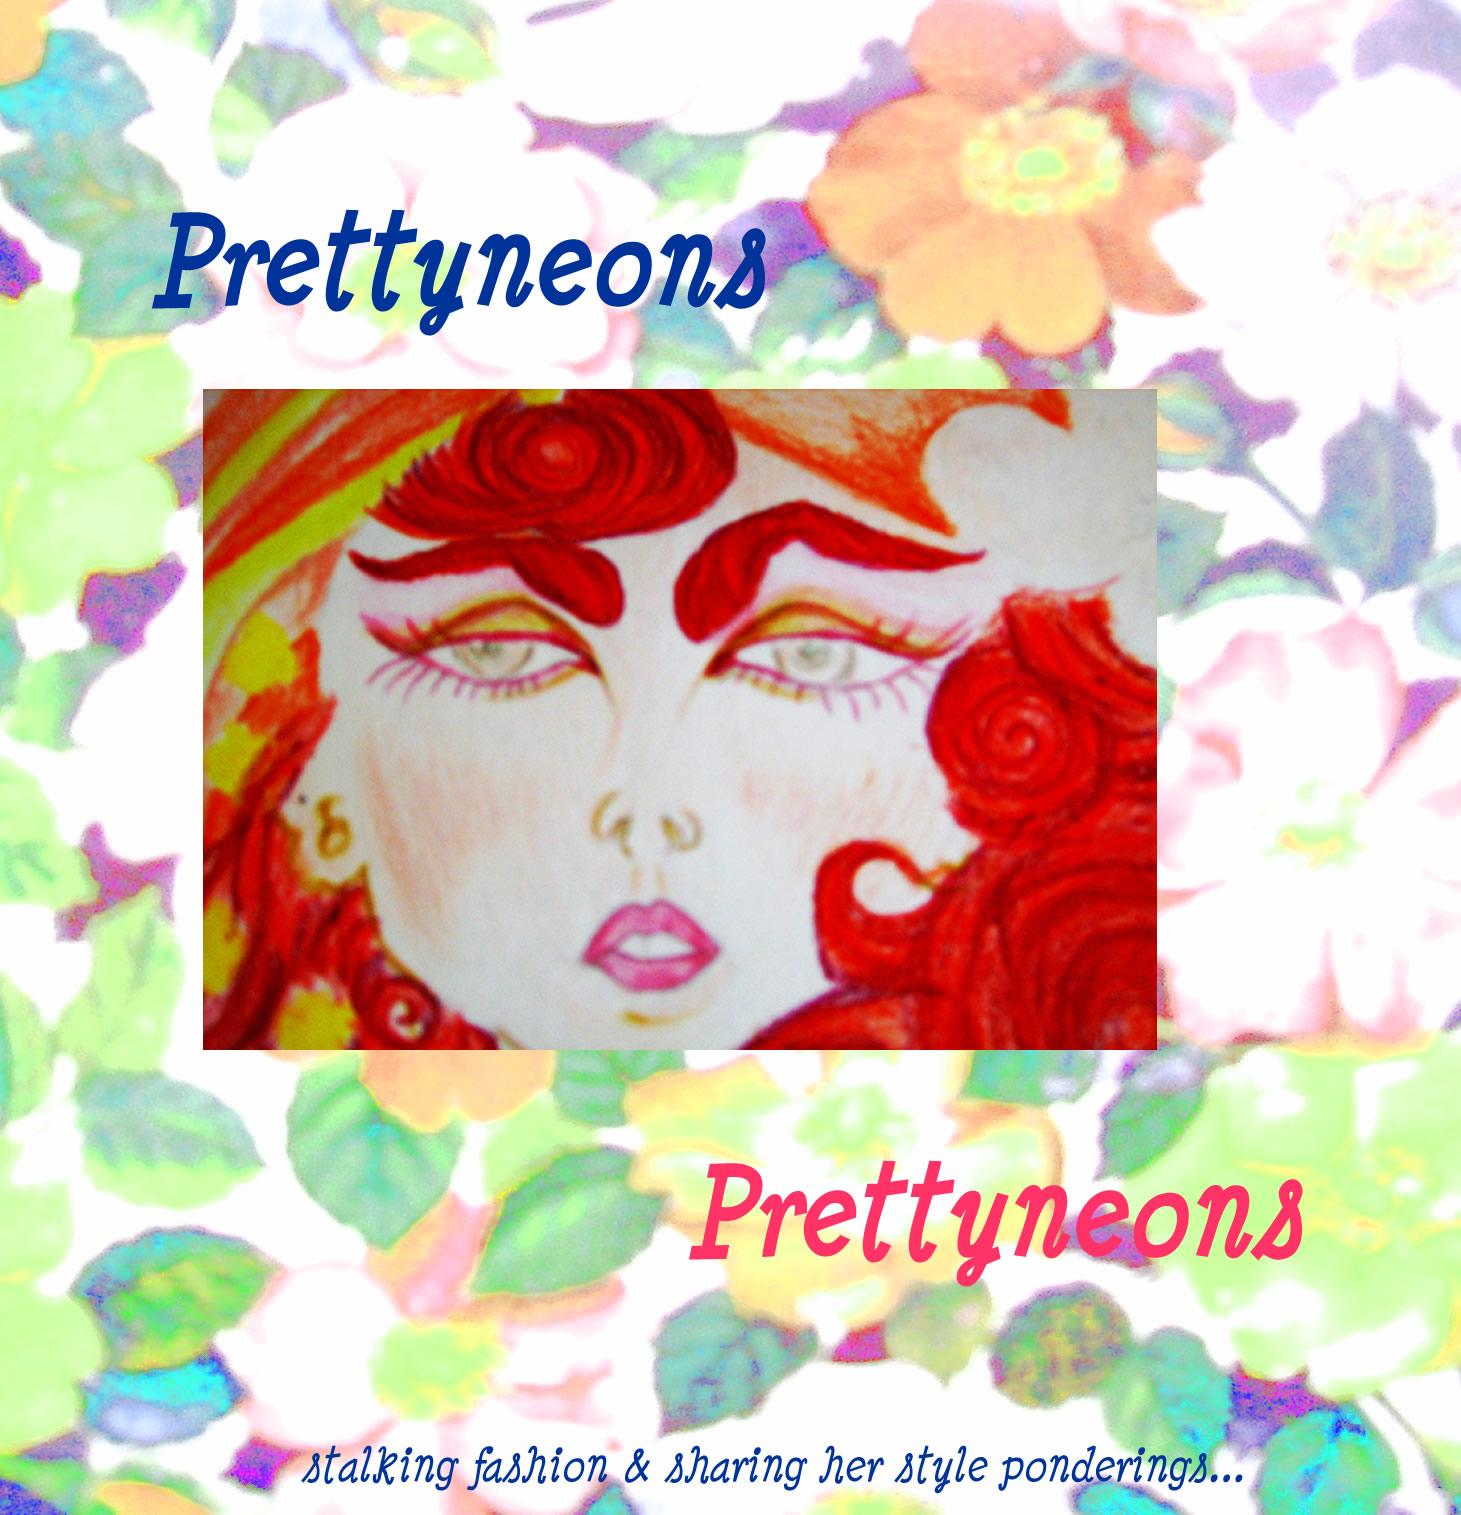 prettyneons